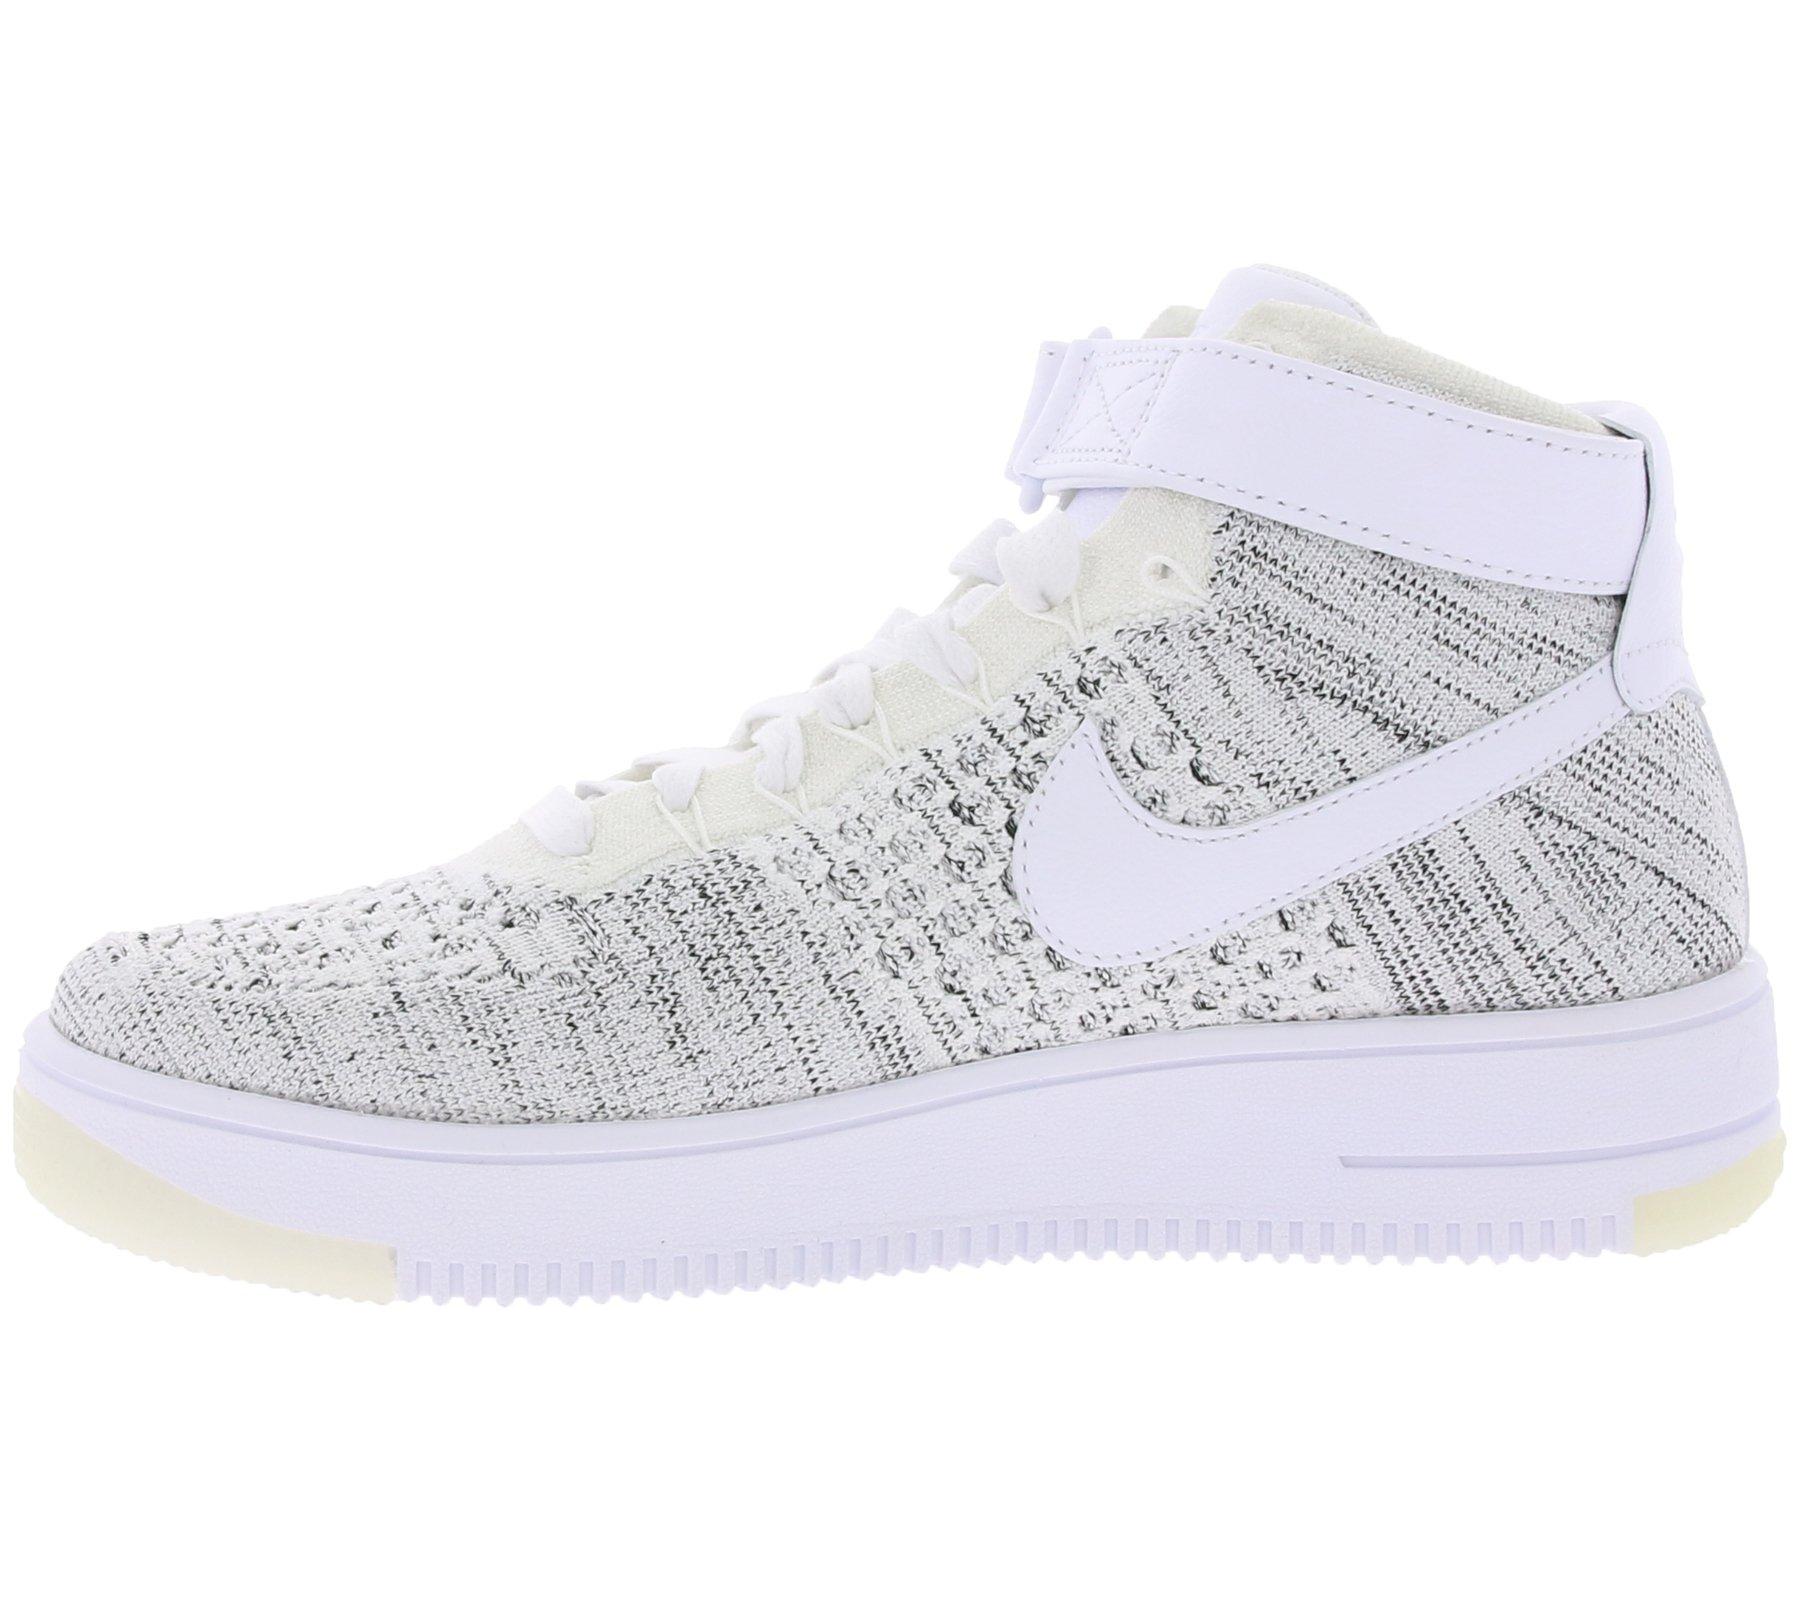 Bianco Flyknit W 818018101 Taglia 5 40 AF1 Colore Nike Grigio q1ROXwx1